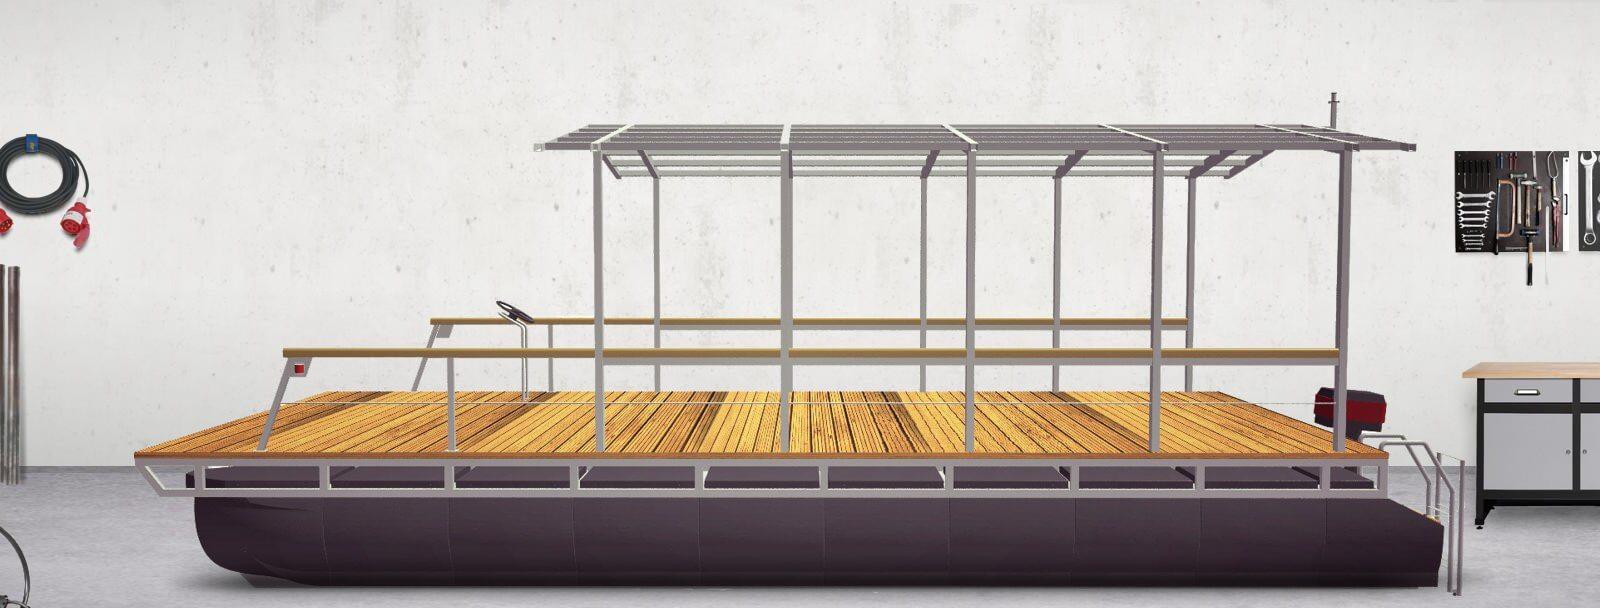 Pontoon platform with roof framework